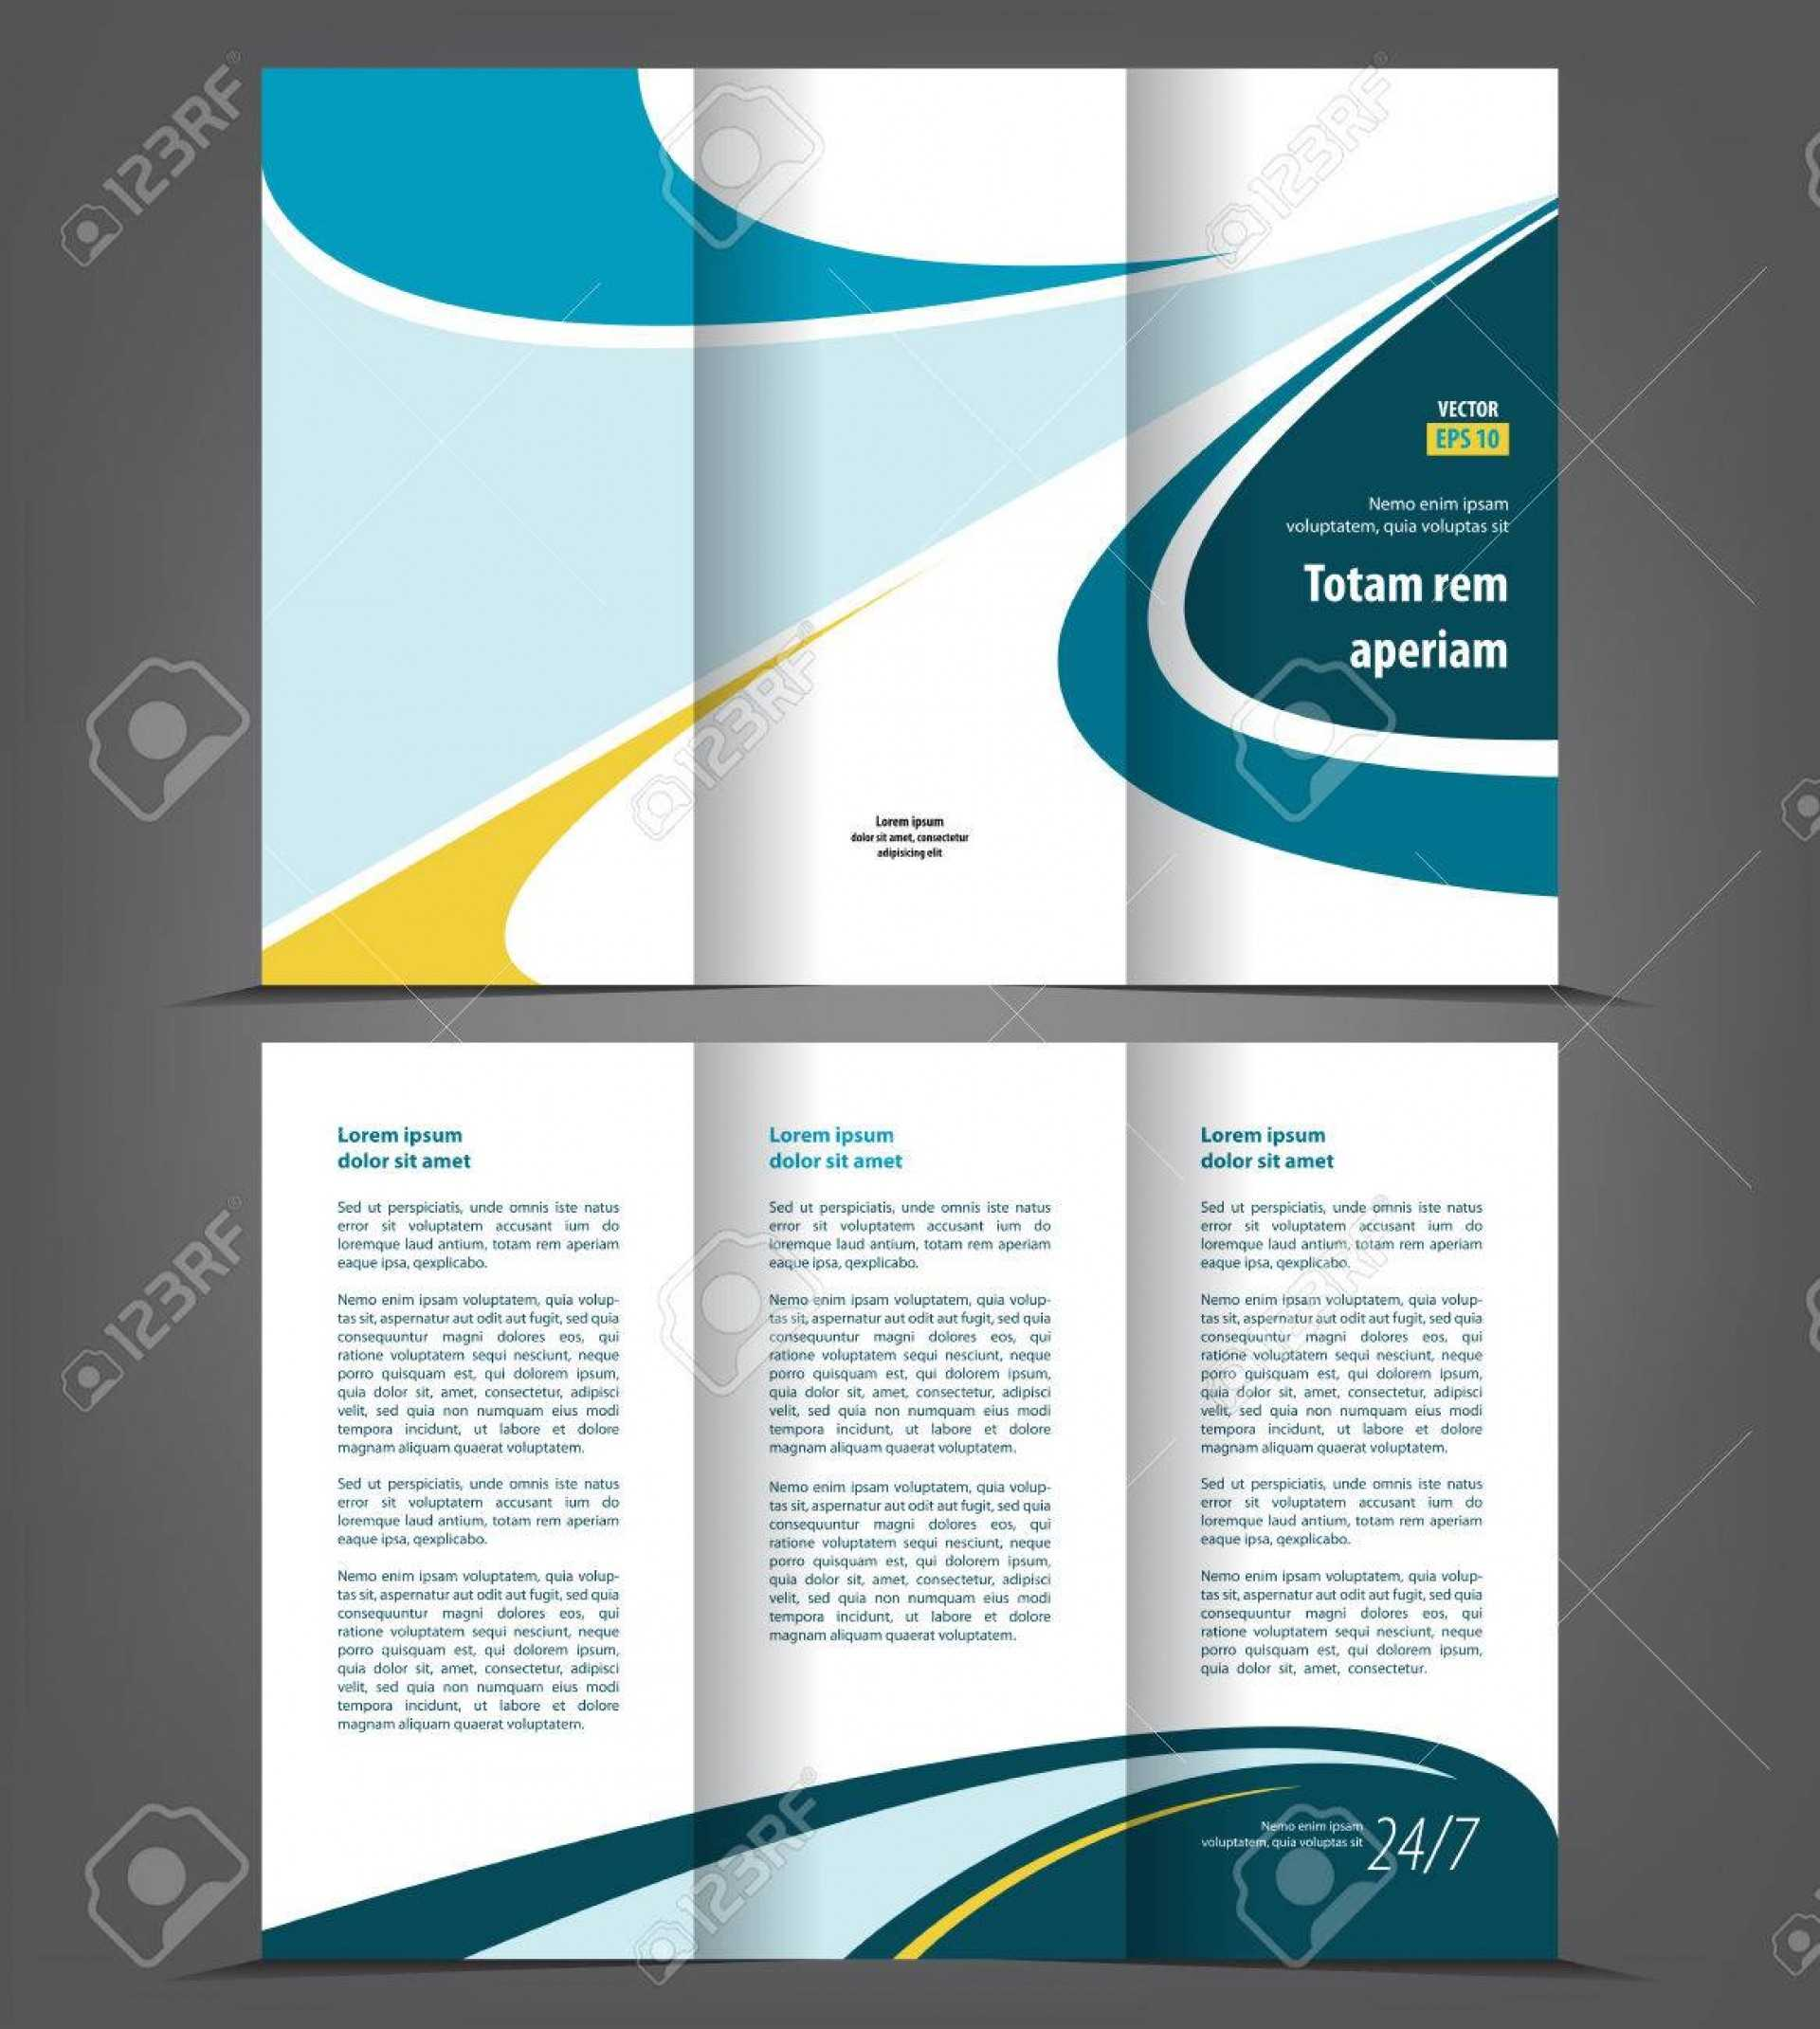 001 Fold Brochure Templates Professional Corporate Tri Free With 3 Fold Brochure Template Free Download